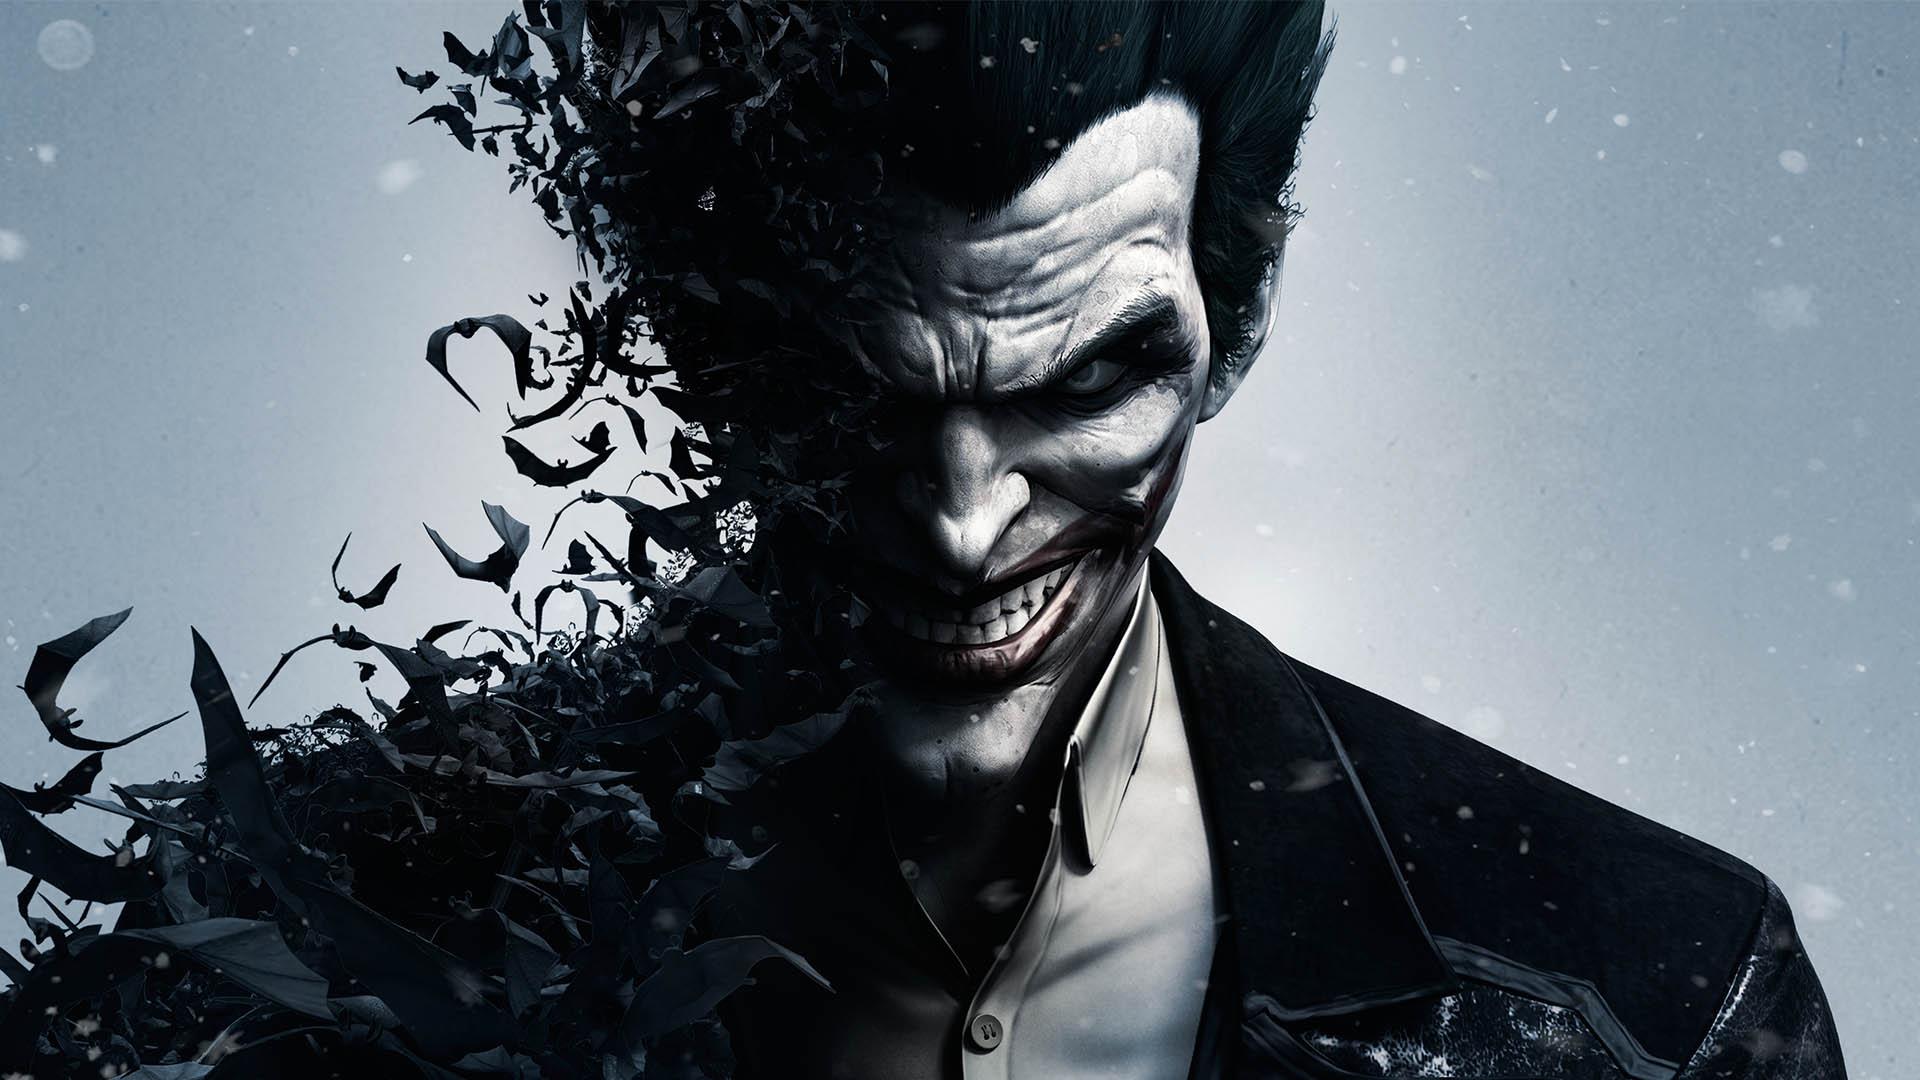 Batman   Arkham Origins   Joker Wallpaper HD   Select Game 1920x1080